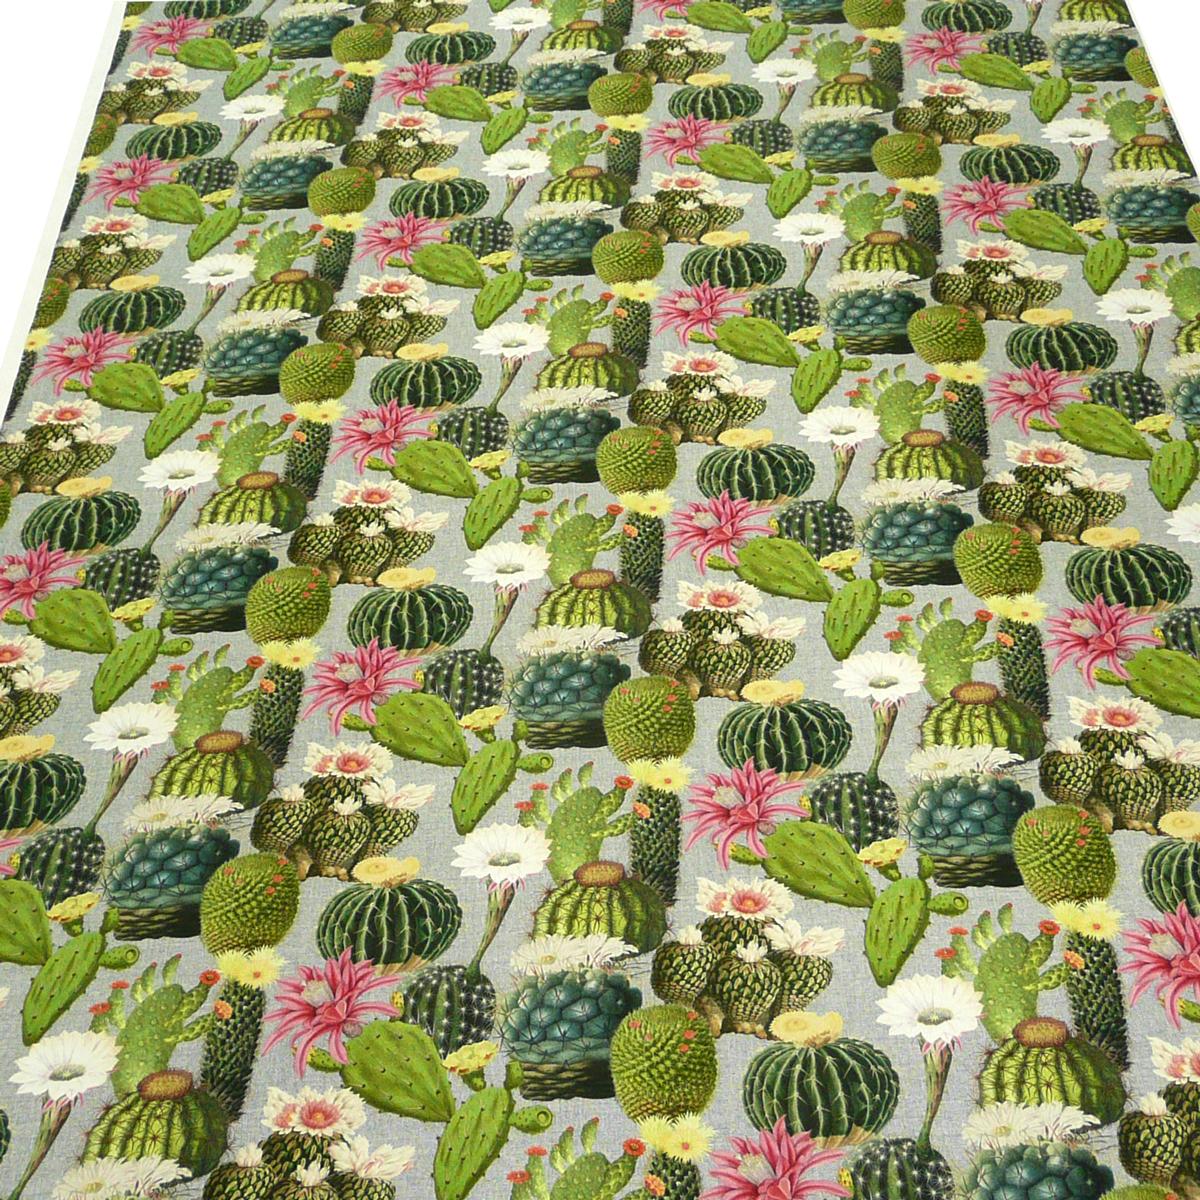 zugluftstopper kaktus kakteen grau gr n 80 bis 130cm lang wohntextilien kissen zugluftstopper. Black Bedroom Furniture Sets. Home Design Ideas